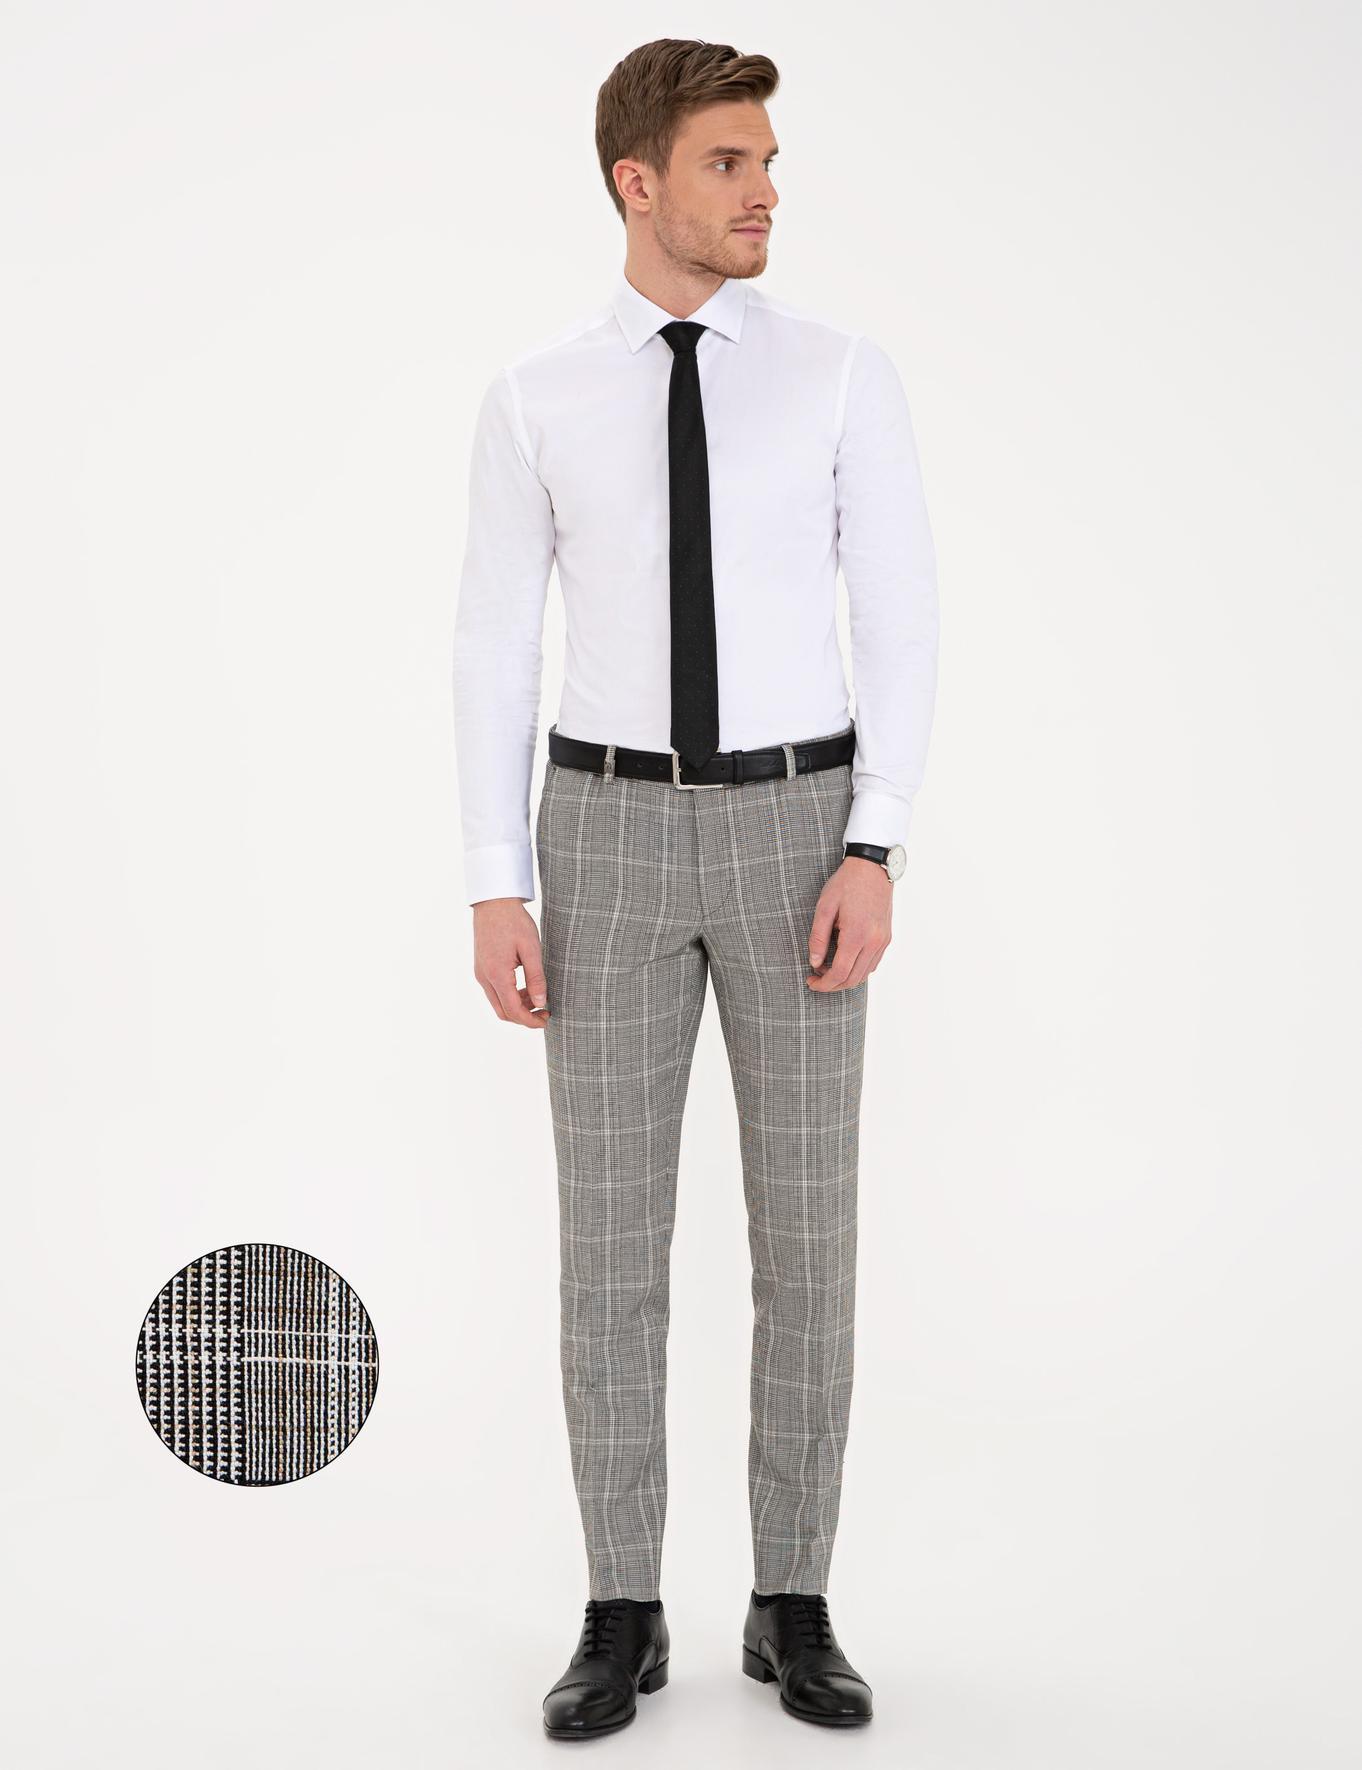 Siyah Ekose Ekstra Slim Fit Pantolon